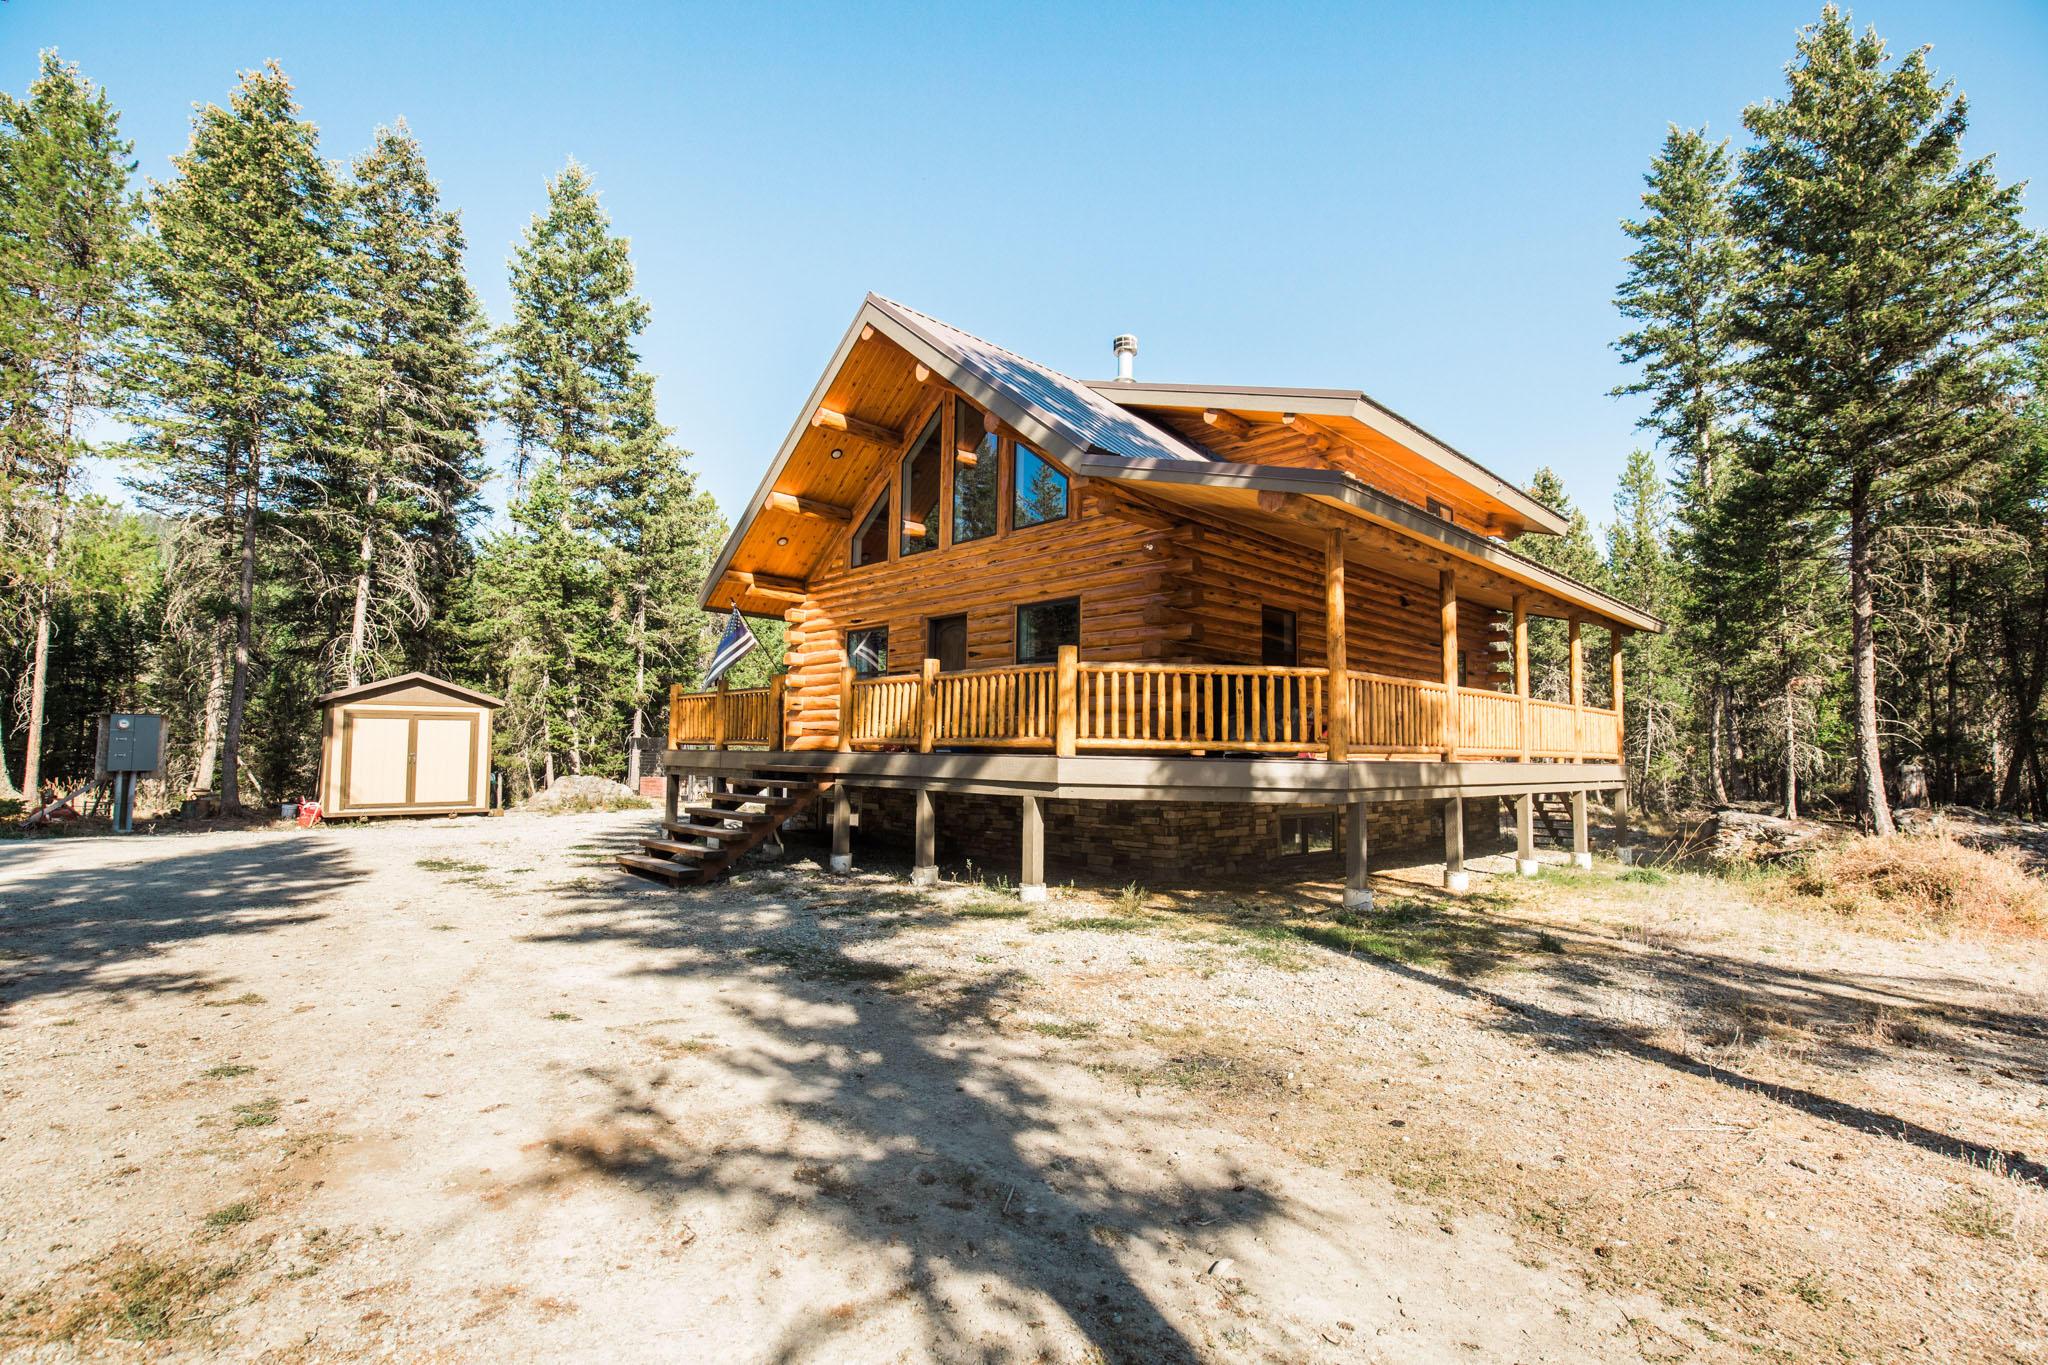 73 Blazing Trail Kalispell Montana 59901 Single Family Homes for Sale